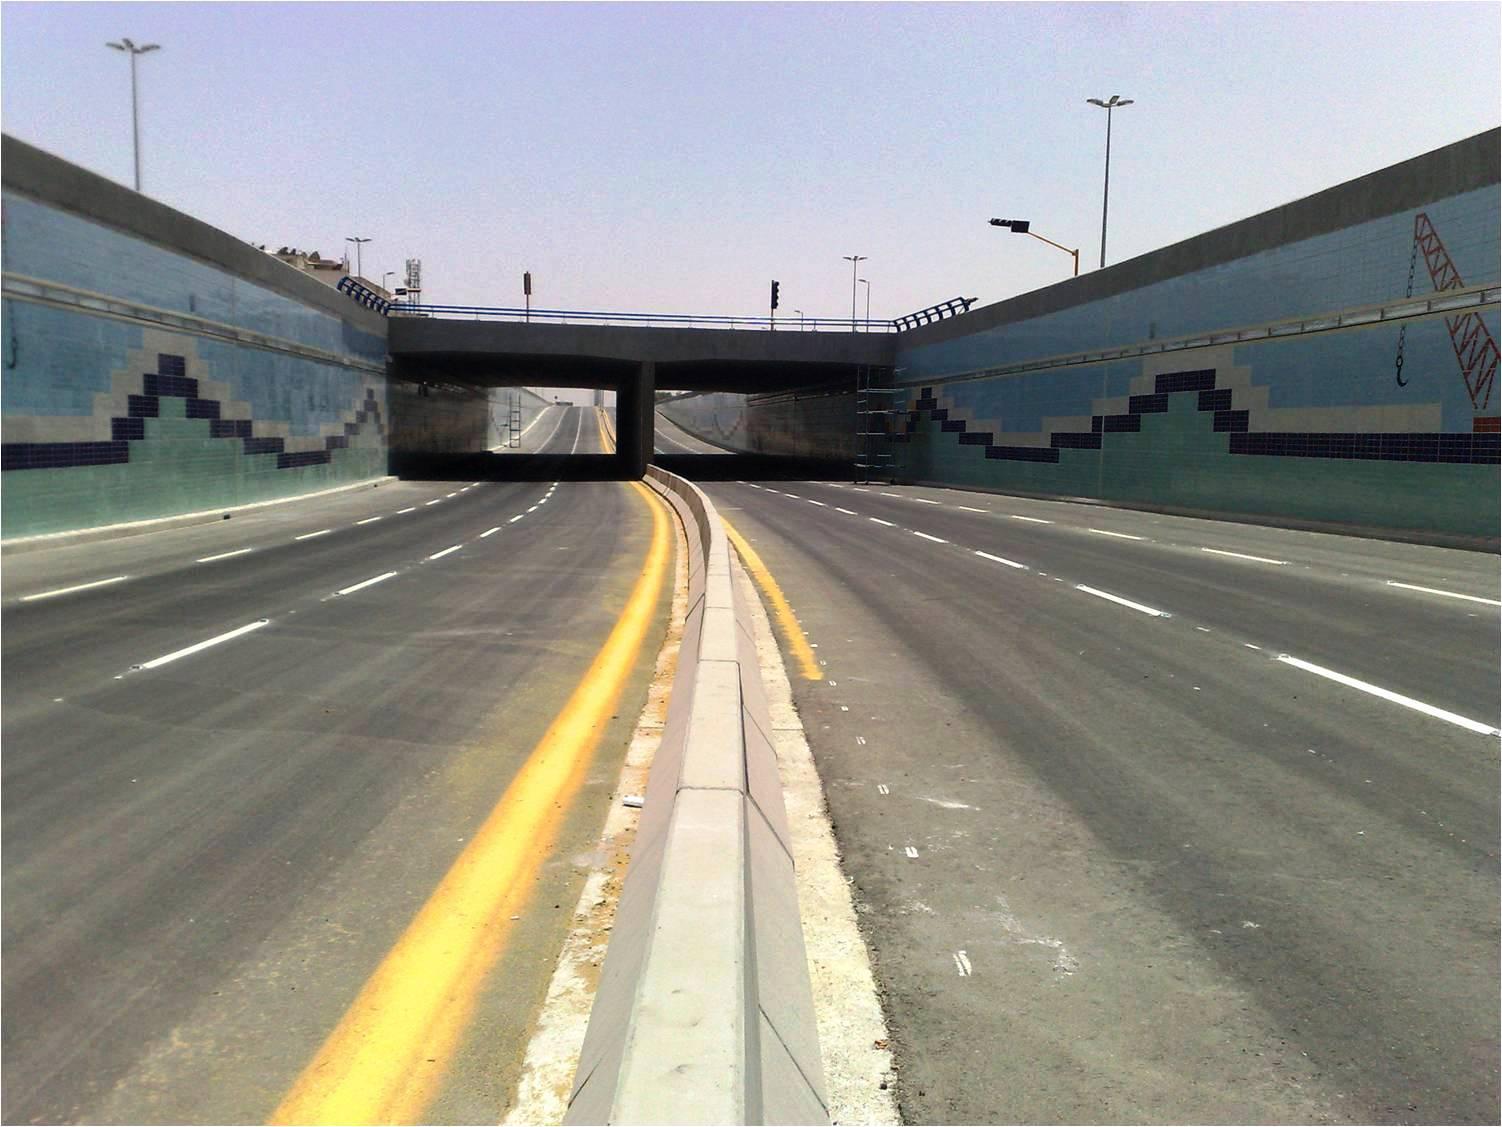 Underpass of King Abdulaziz with King Faisal – Dammam